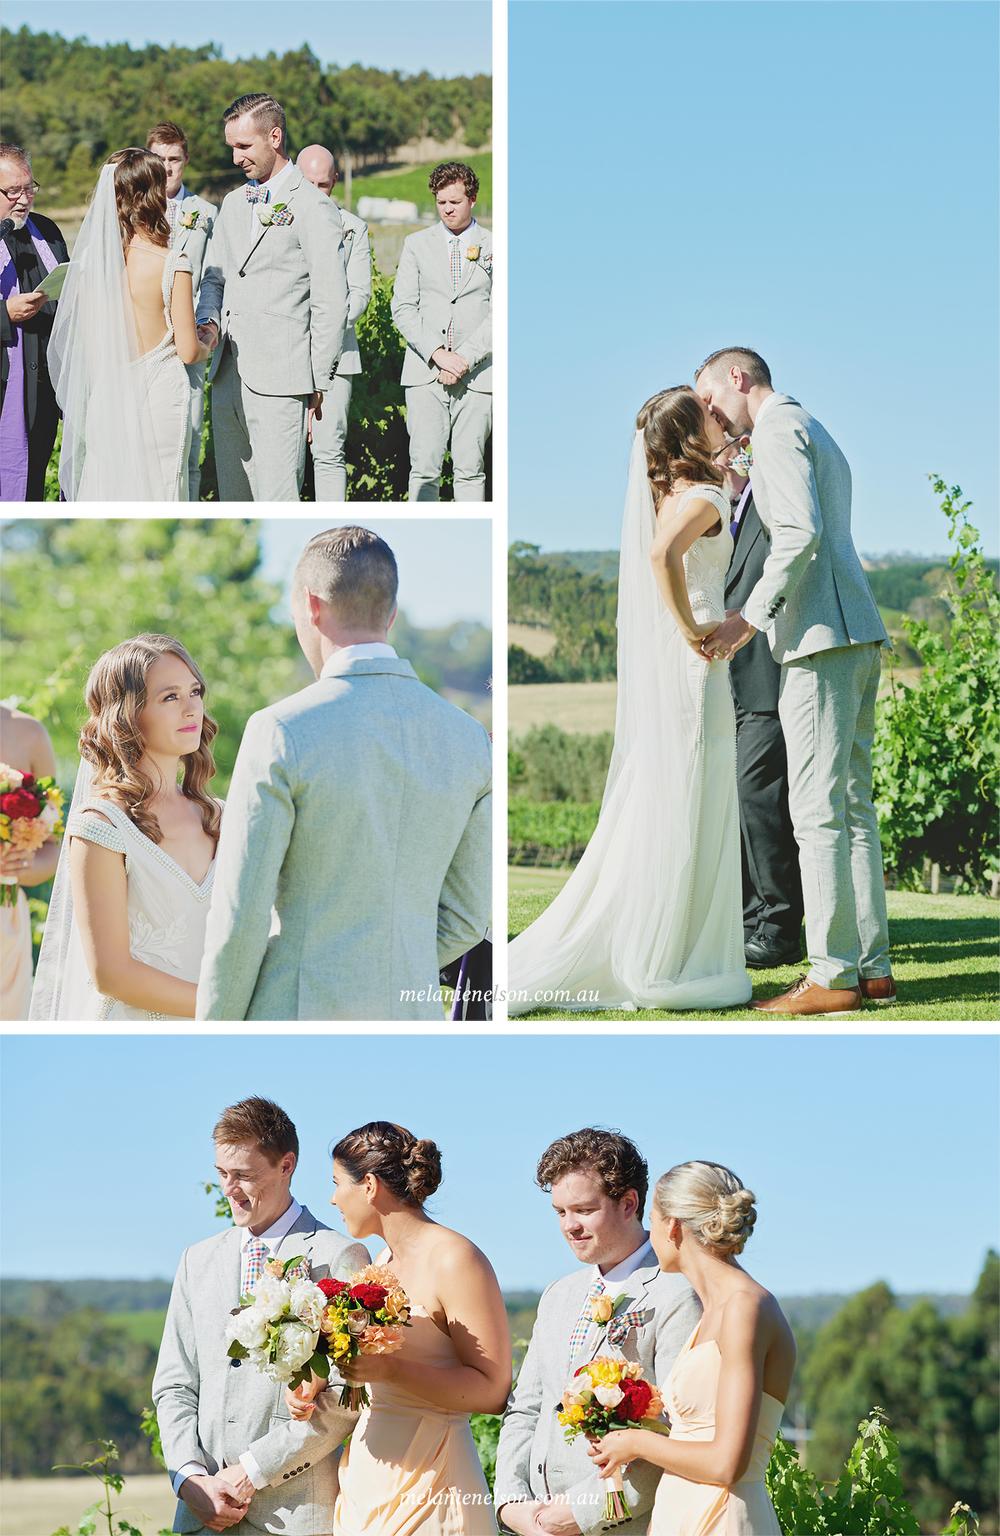 bird-in-hand-wedding-photography14